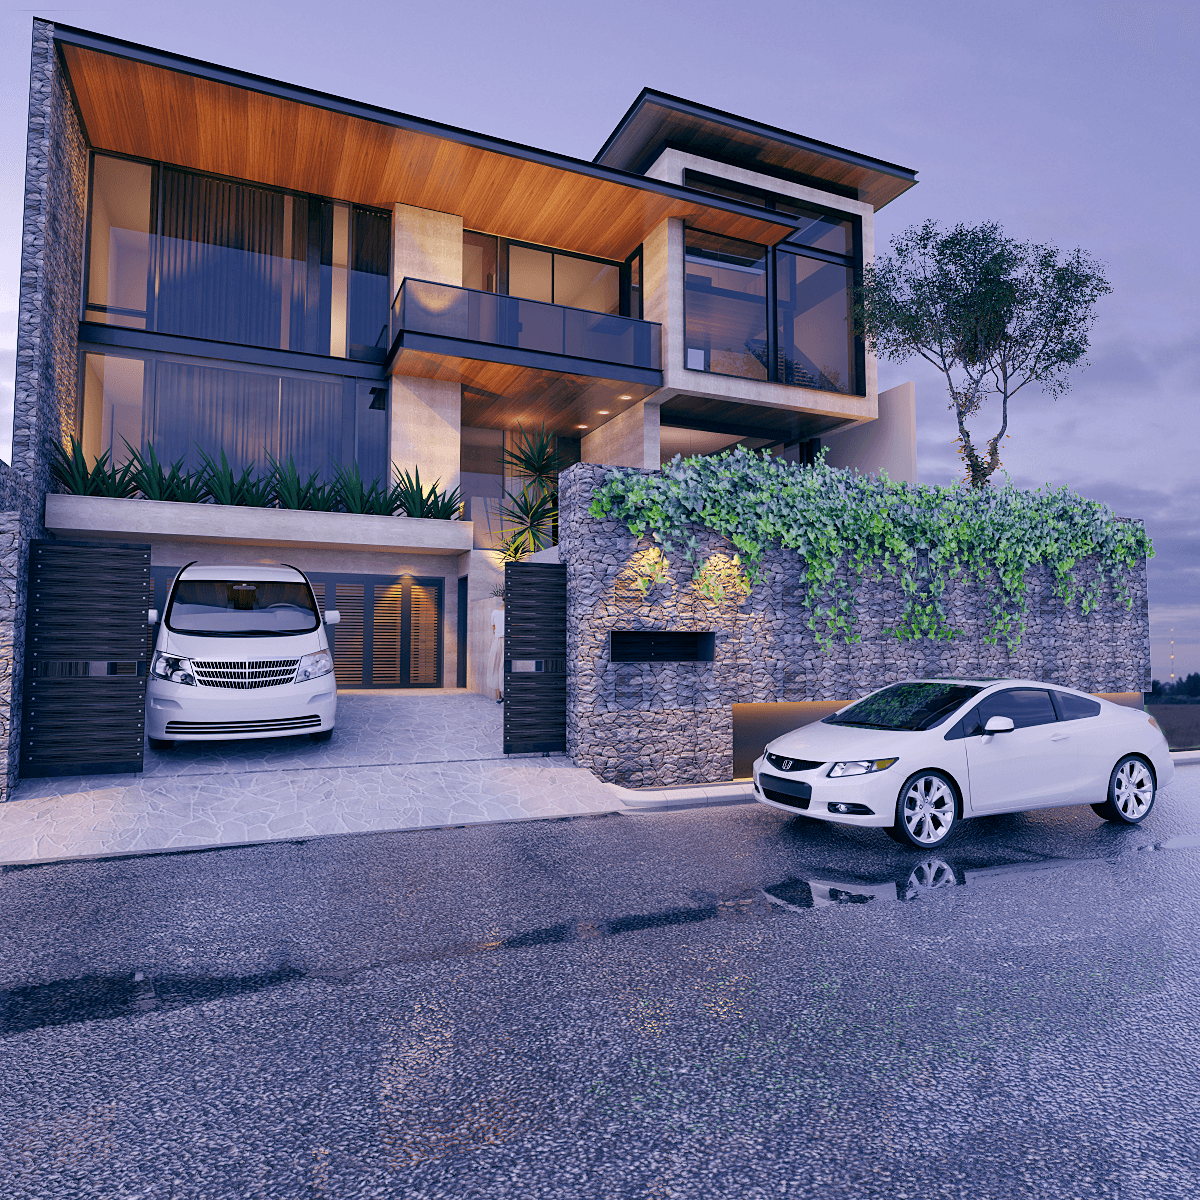 Pt. Indodesign Kreasi Mandiri Pantai Indah Kapuk House Jakarta, Indonesia Jakarta, Indonesia Facade-Option-1  8628